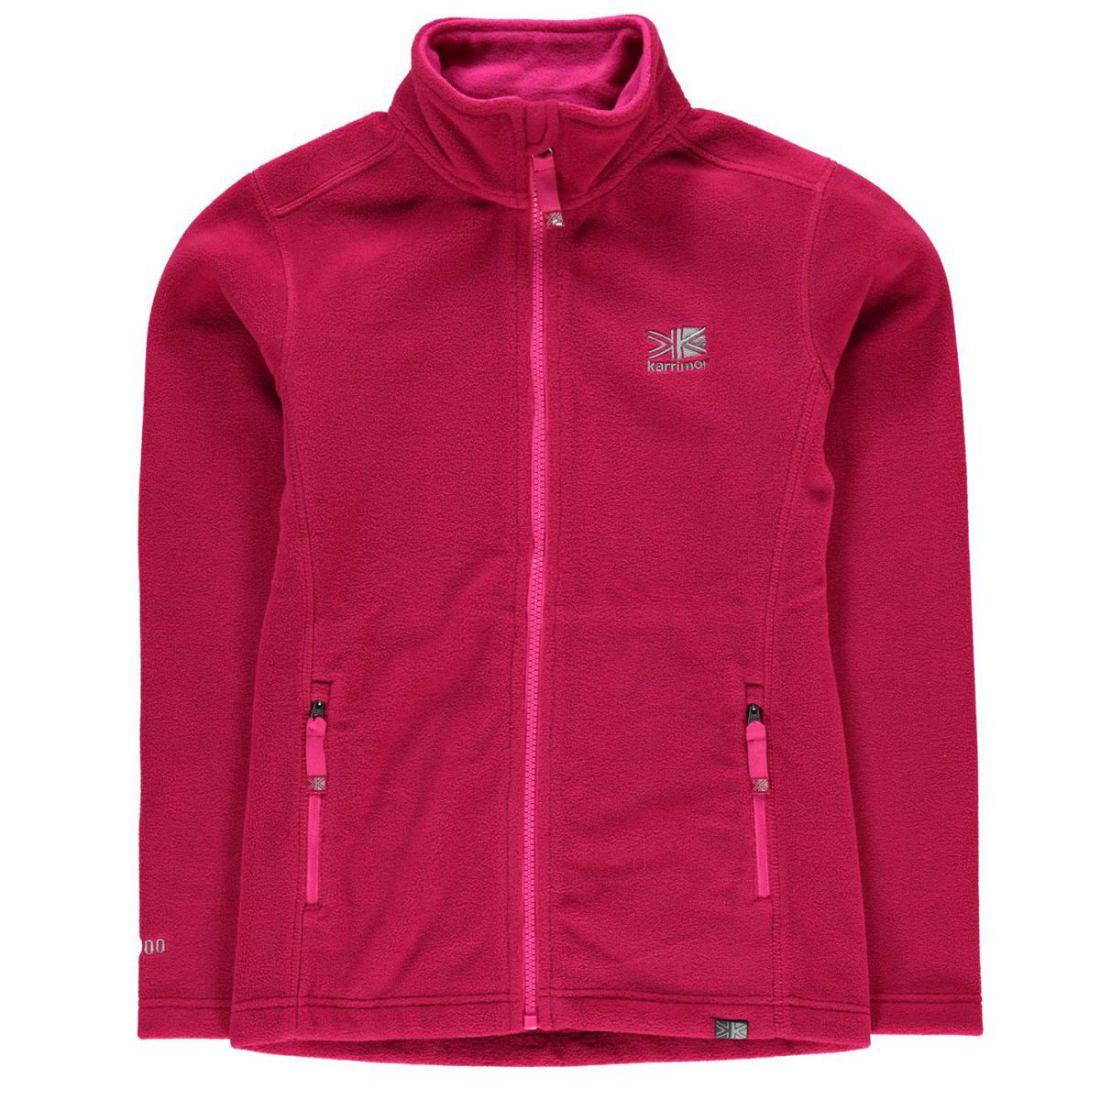 458e65193db1 Karrimor Kids Fleece Jacket Junior Girls Thermal Warm Up High Neck ...